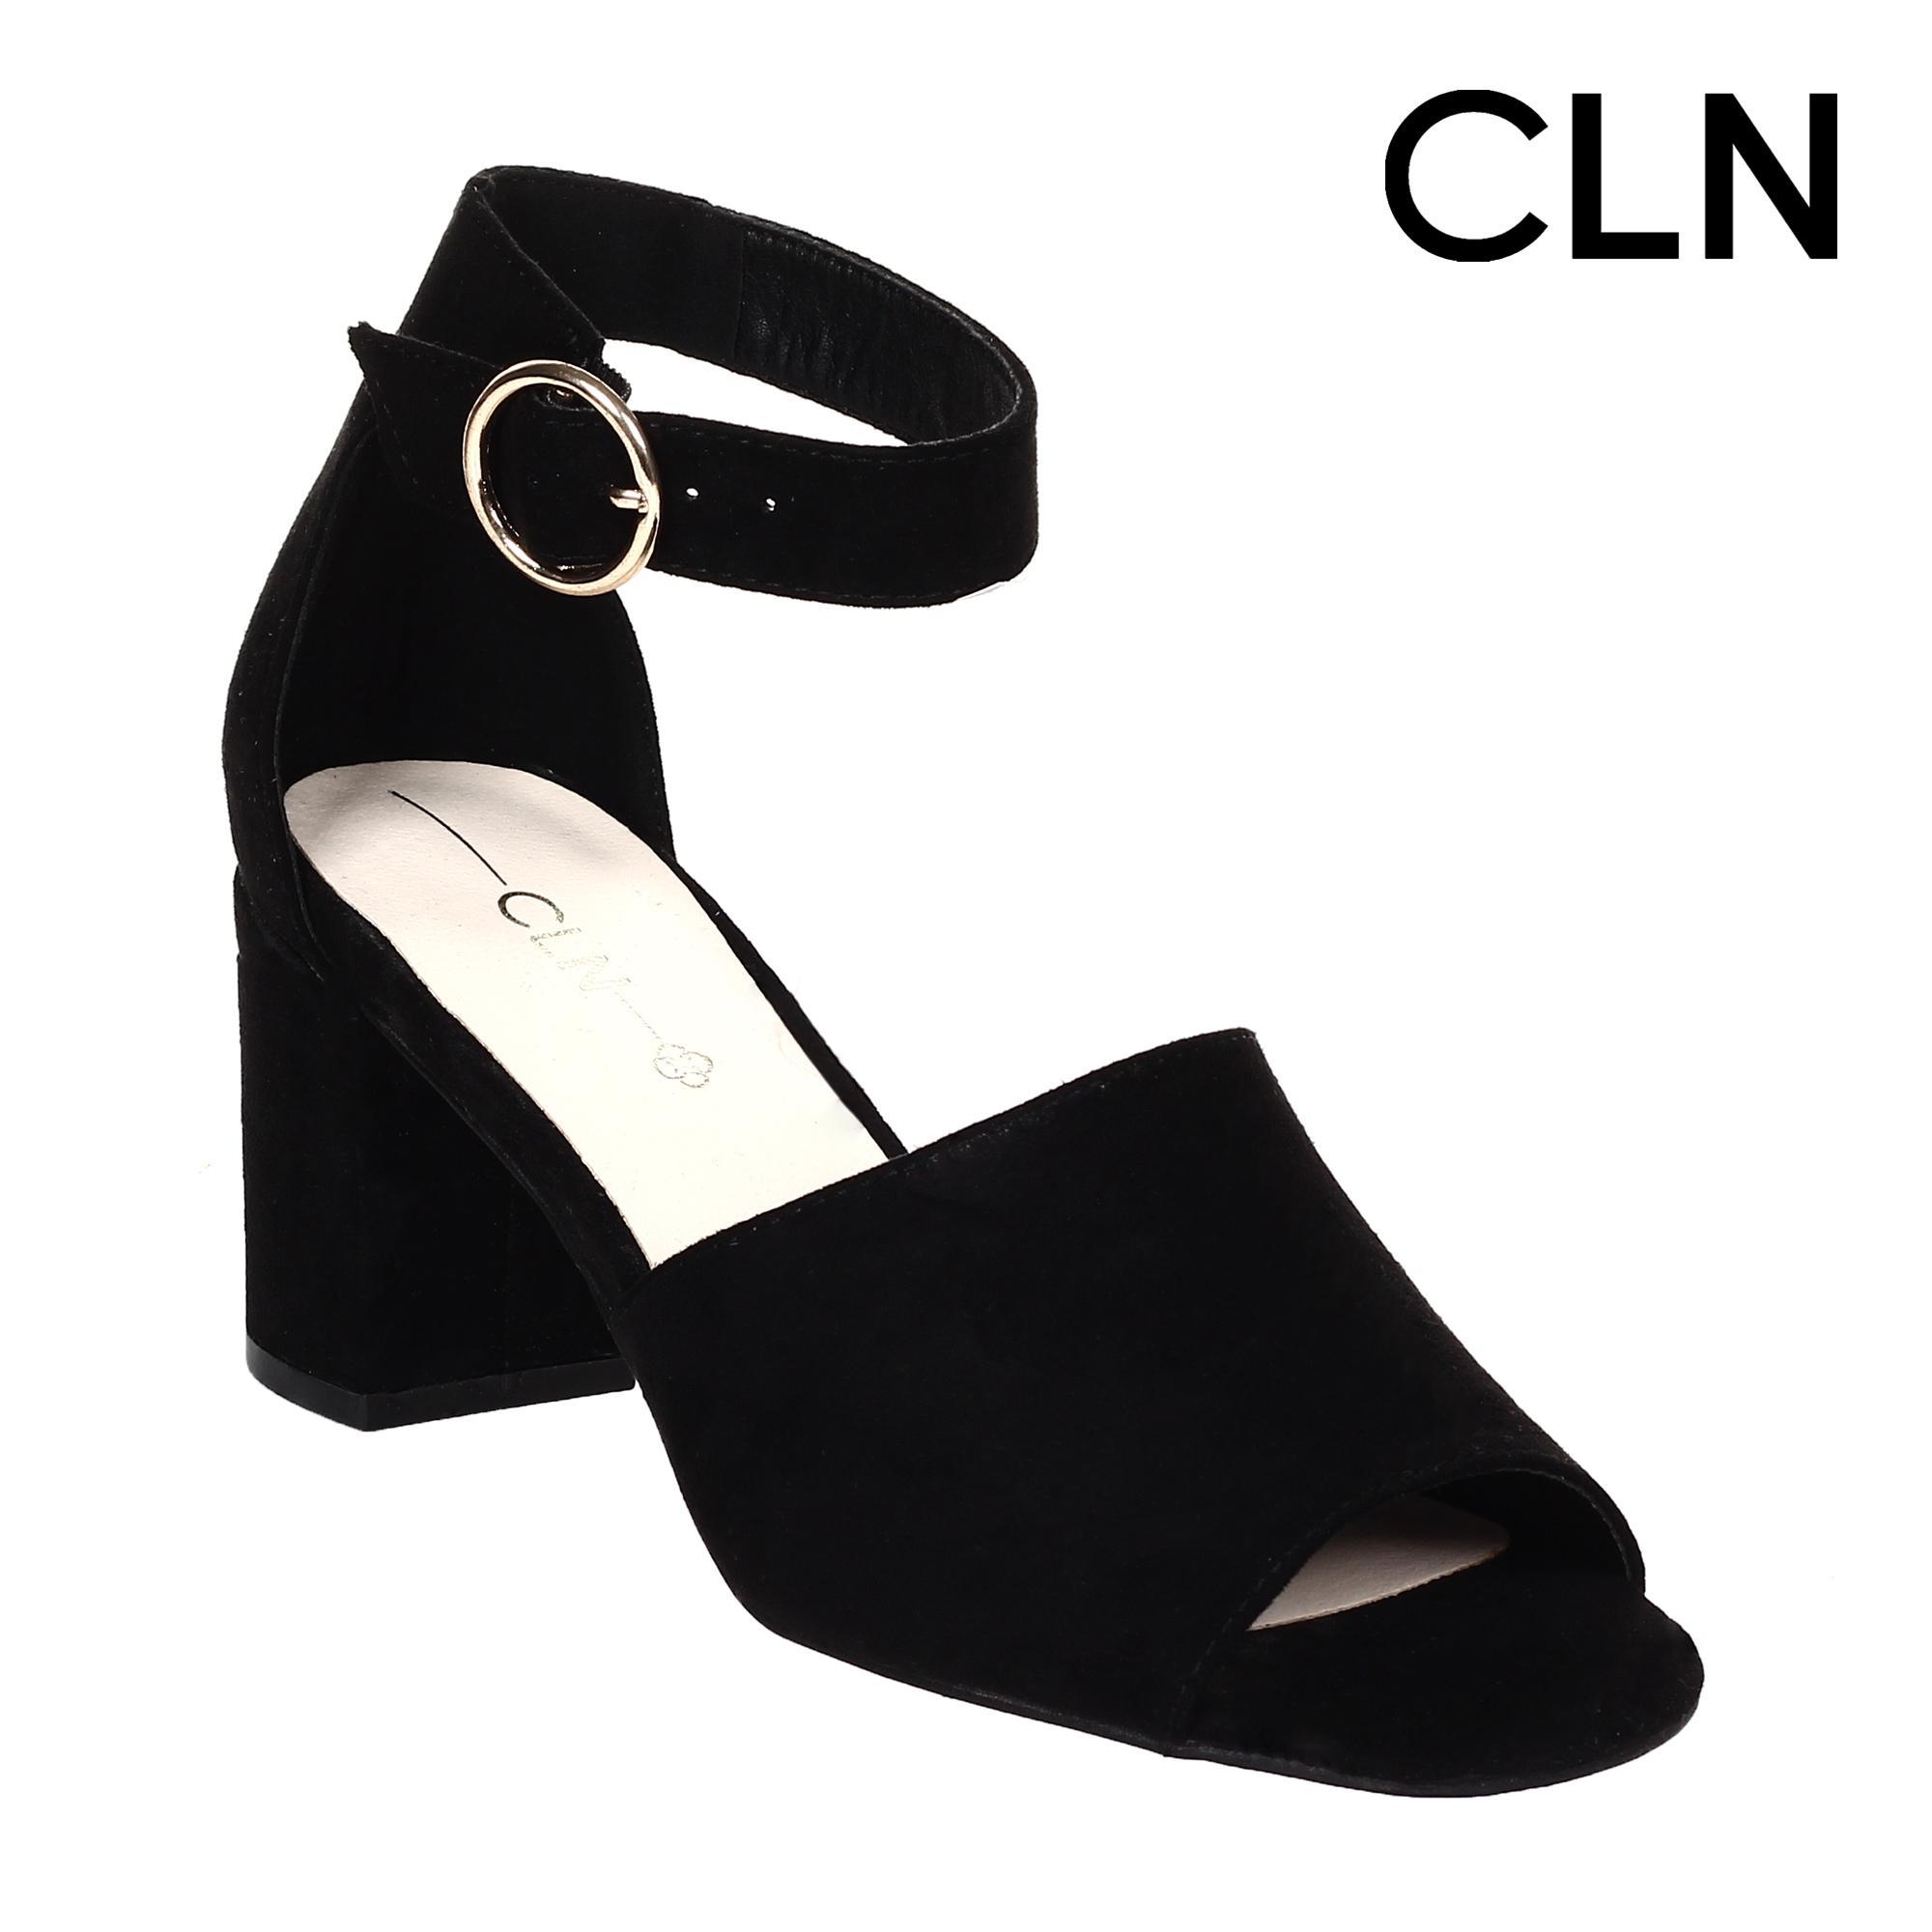 19G Mollie heeled Sandals